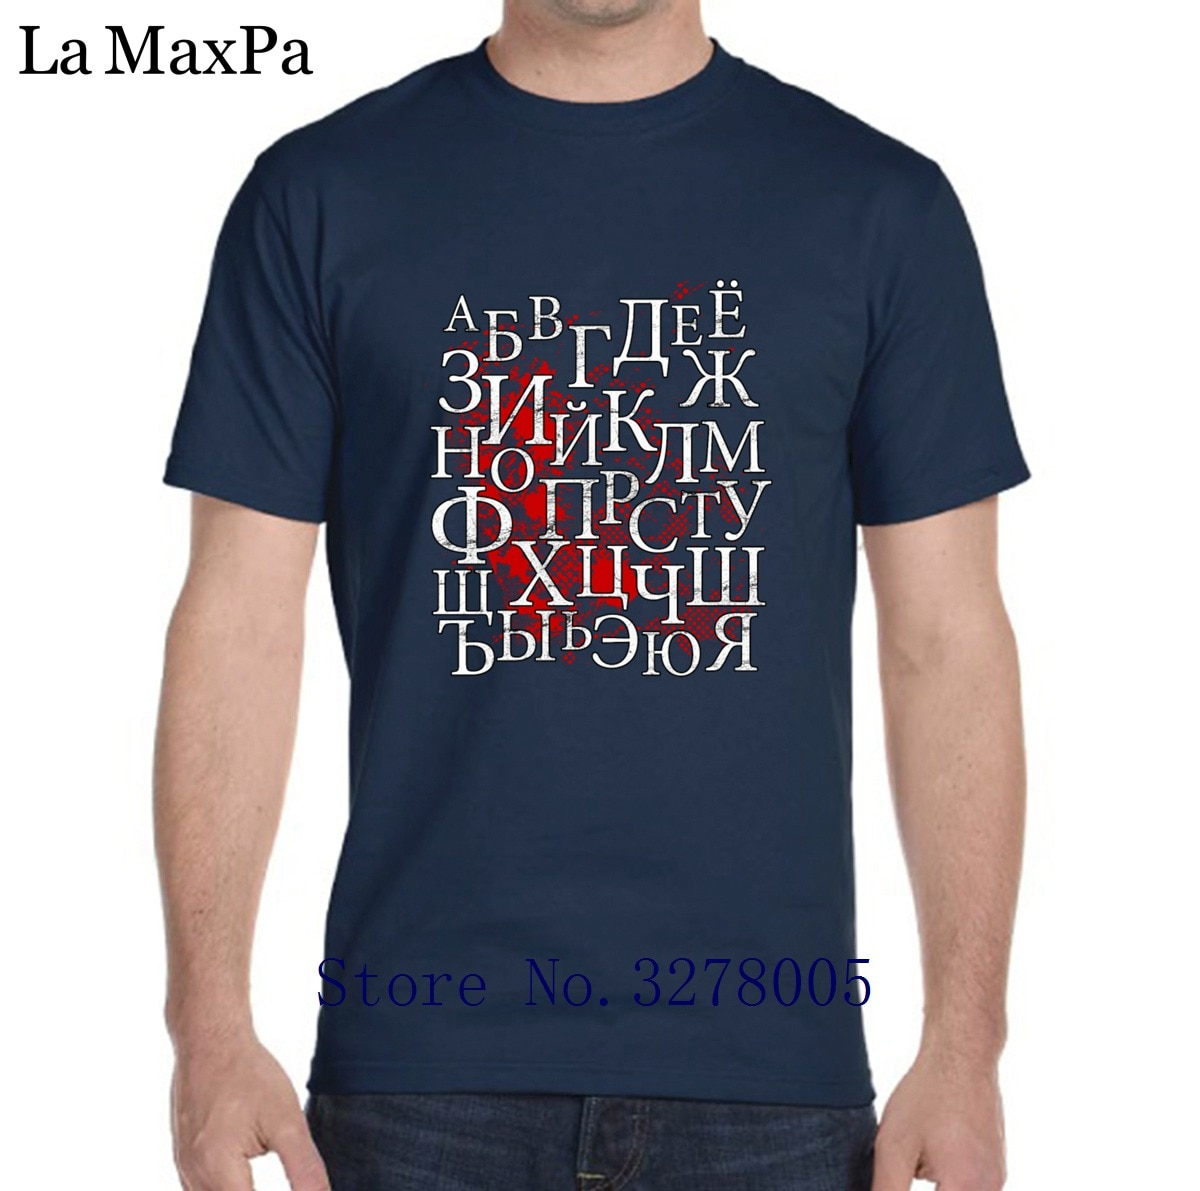 La Maxza T Shirt Solid Color Classical Cyrillic Alphabet Red Background Tshirt For Men Leisure 100% Cotton Mens T-Shirt